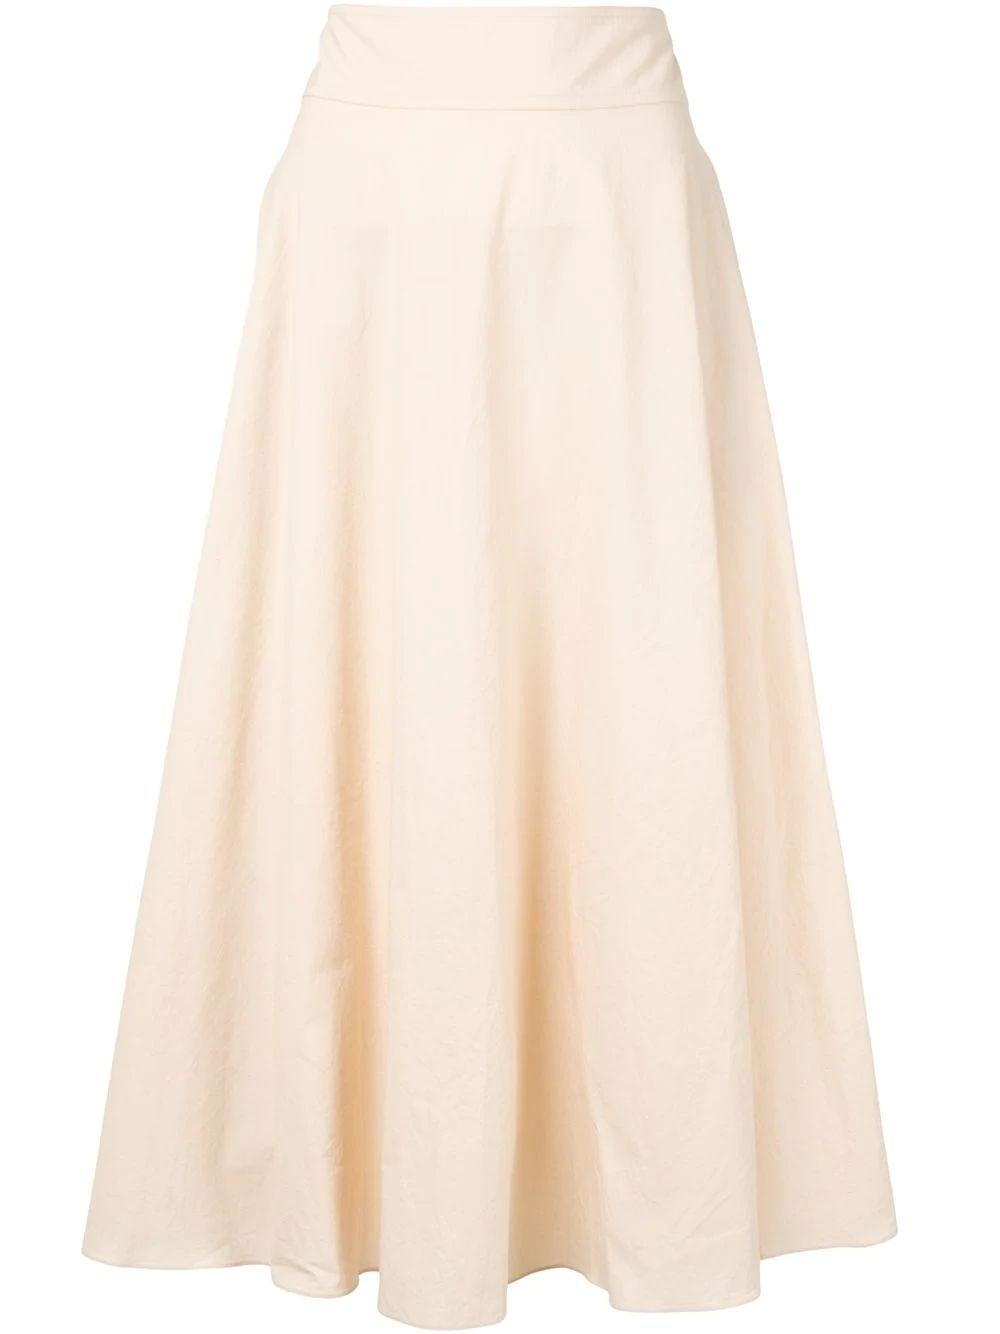 Ninette Textured Cotton Skirt Item # 1032 09 135 5099